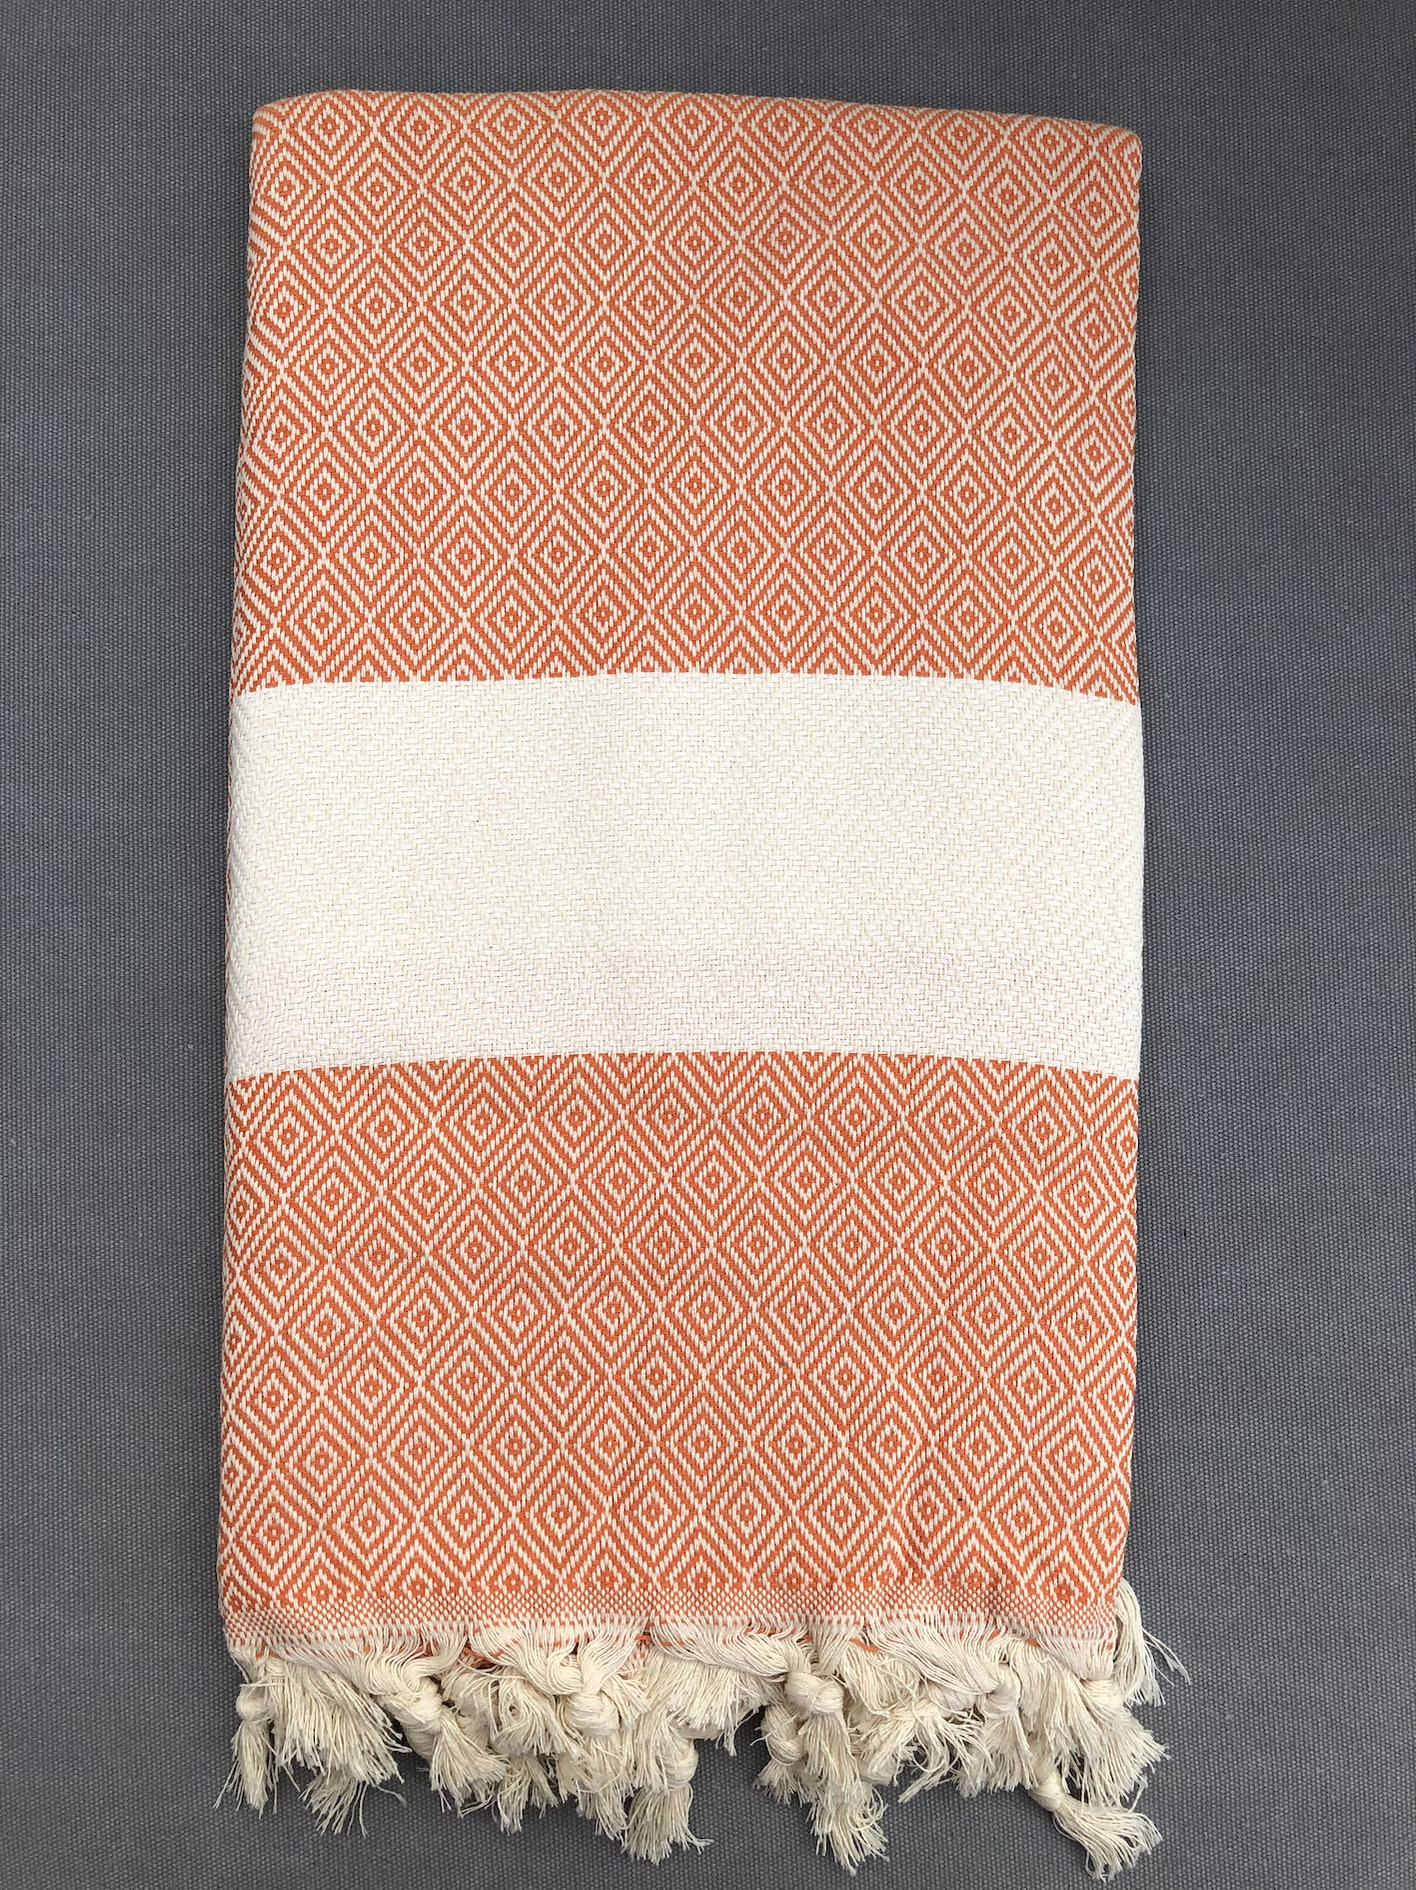 orange-hammam-haandklaede